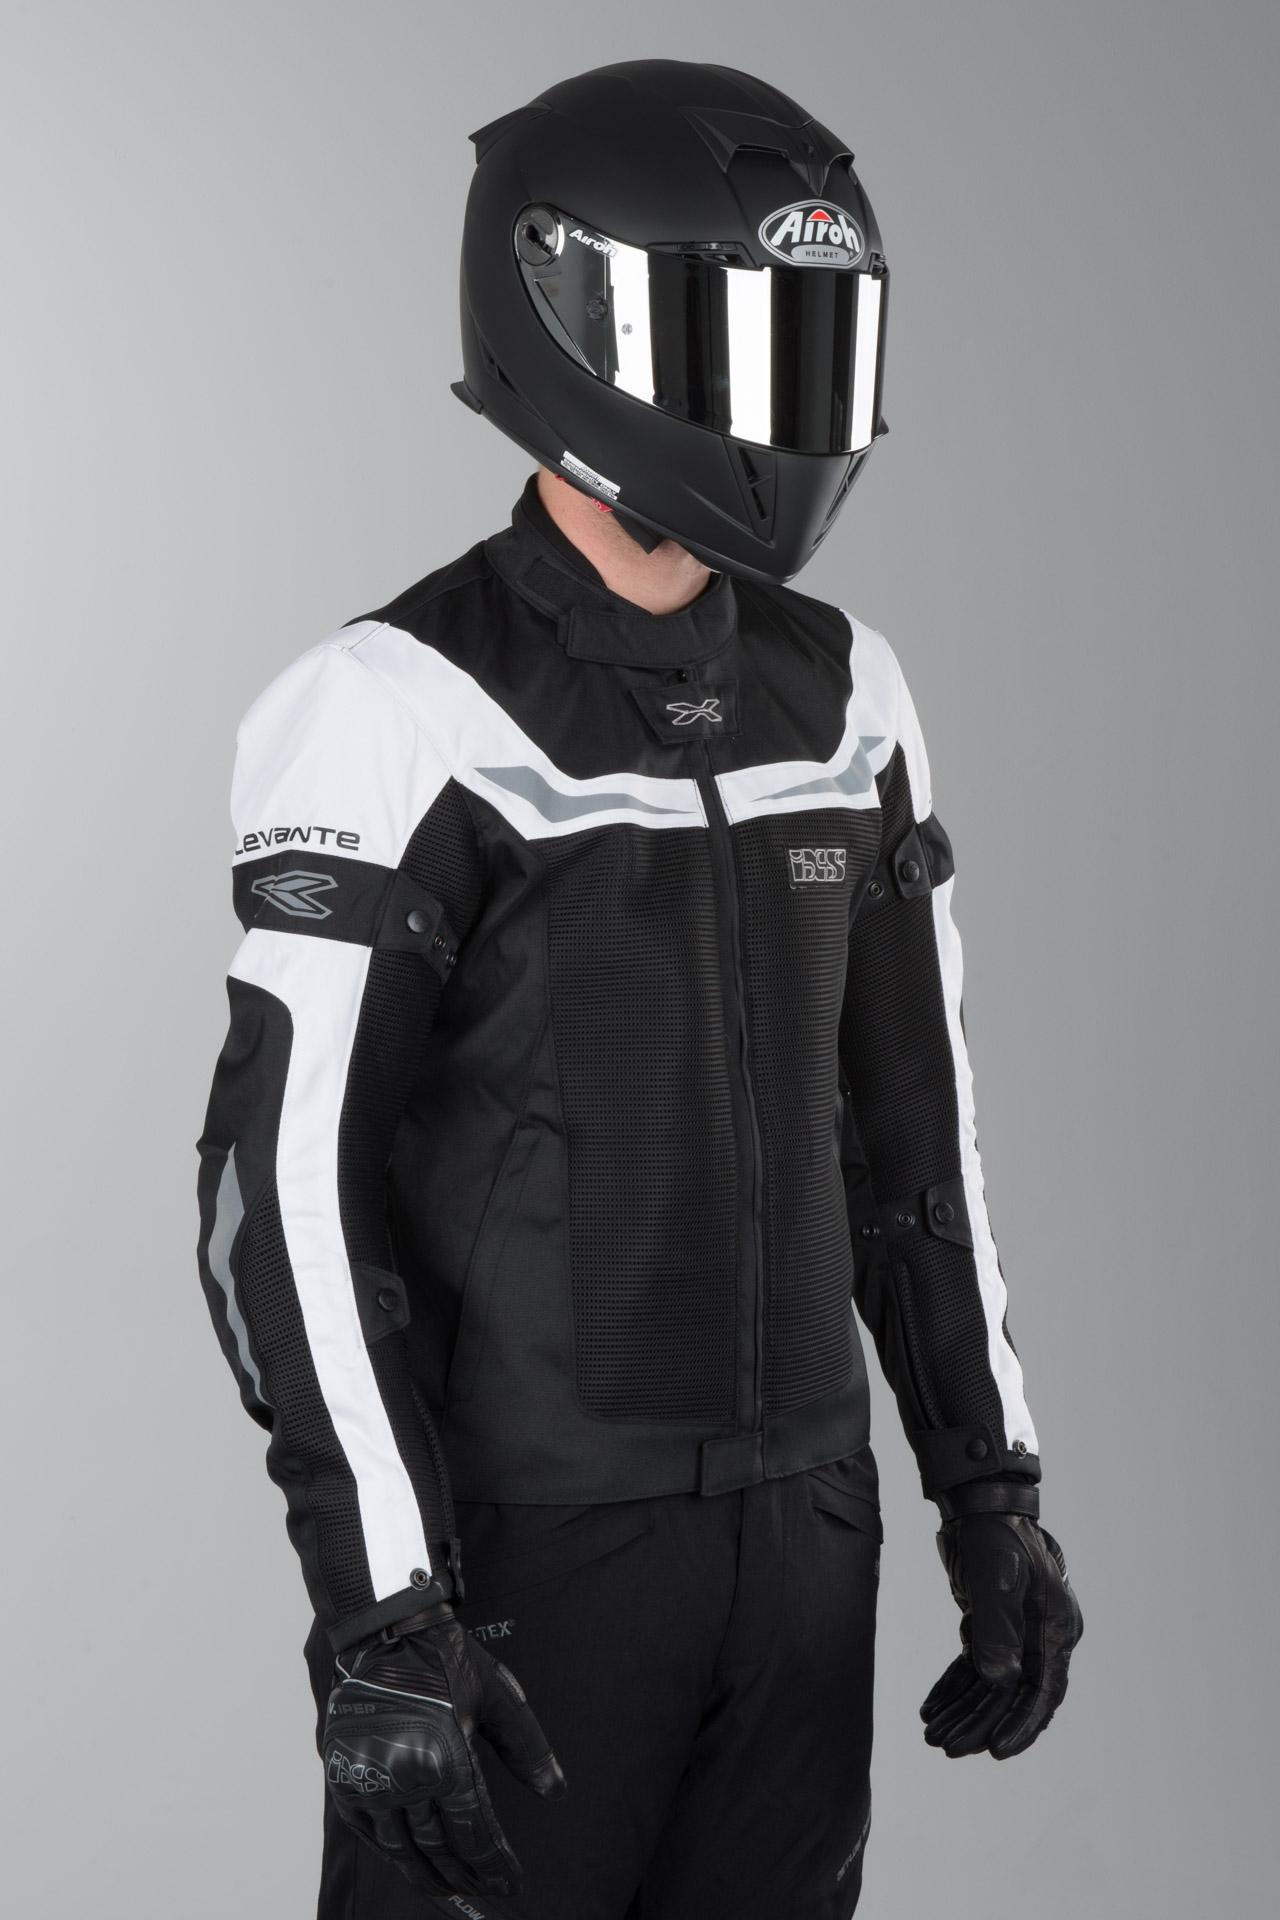 IXS Levante Motoryclce Jacket Black